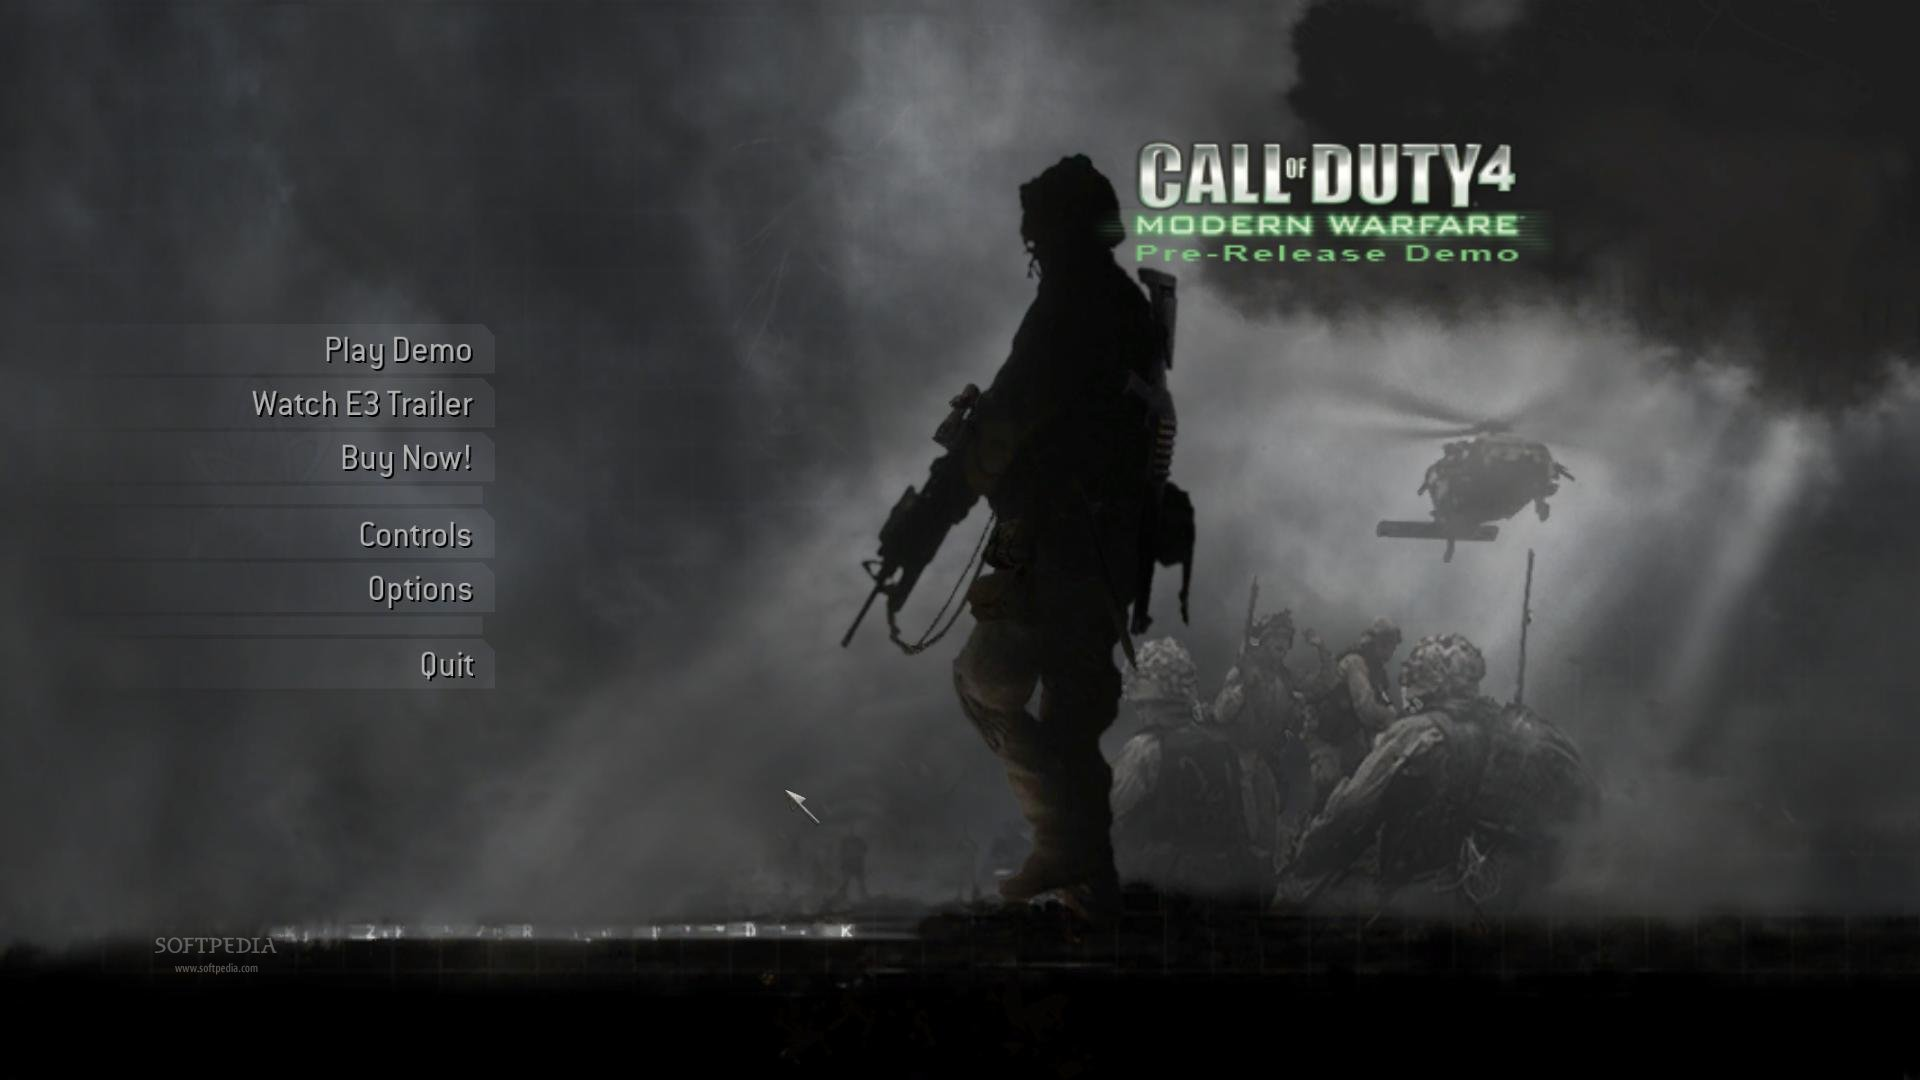 Call Of Duty 4 Modern Warfare Demo Download